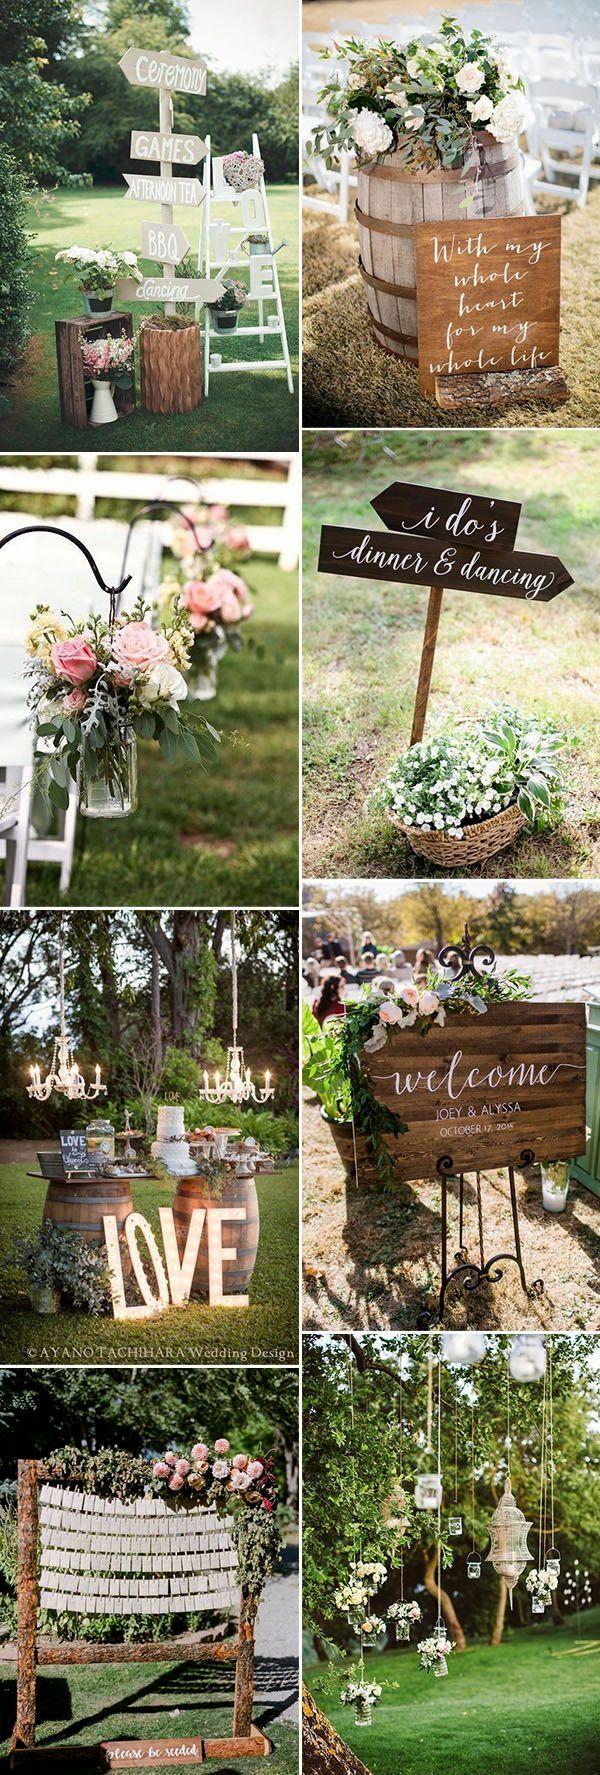 Outdoor Wedding Decoration – H a p p e n i n g